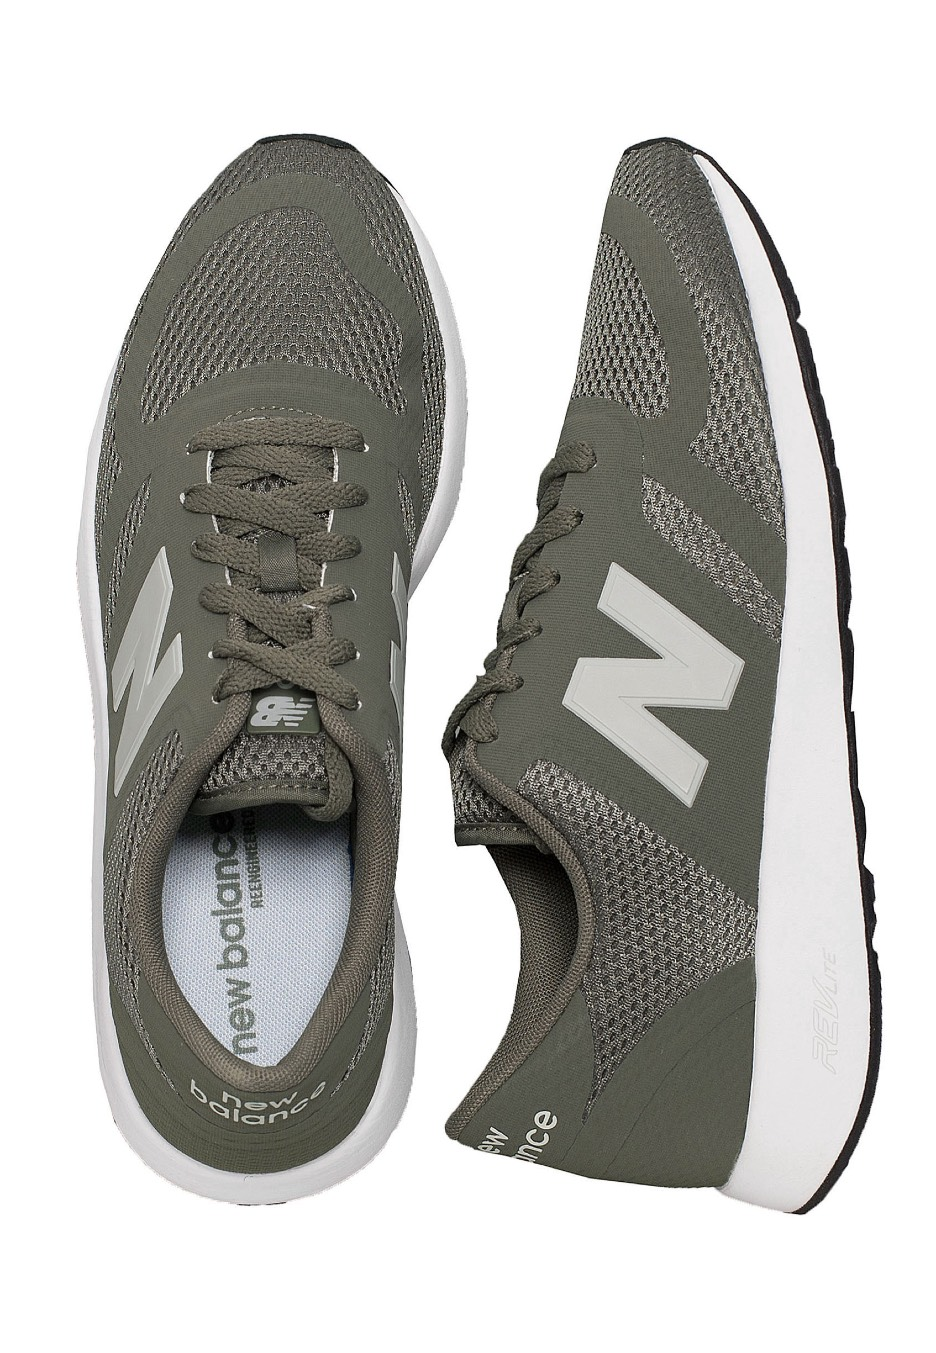 1752c438ad2f New Balance - MRL420OV Military Foliage Green - Shoes - Impericon.com  Worldwide